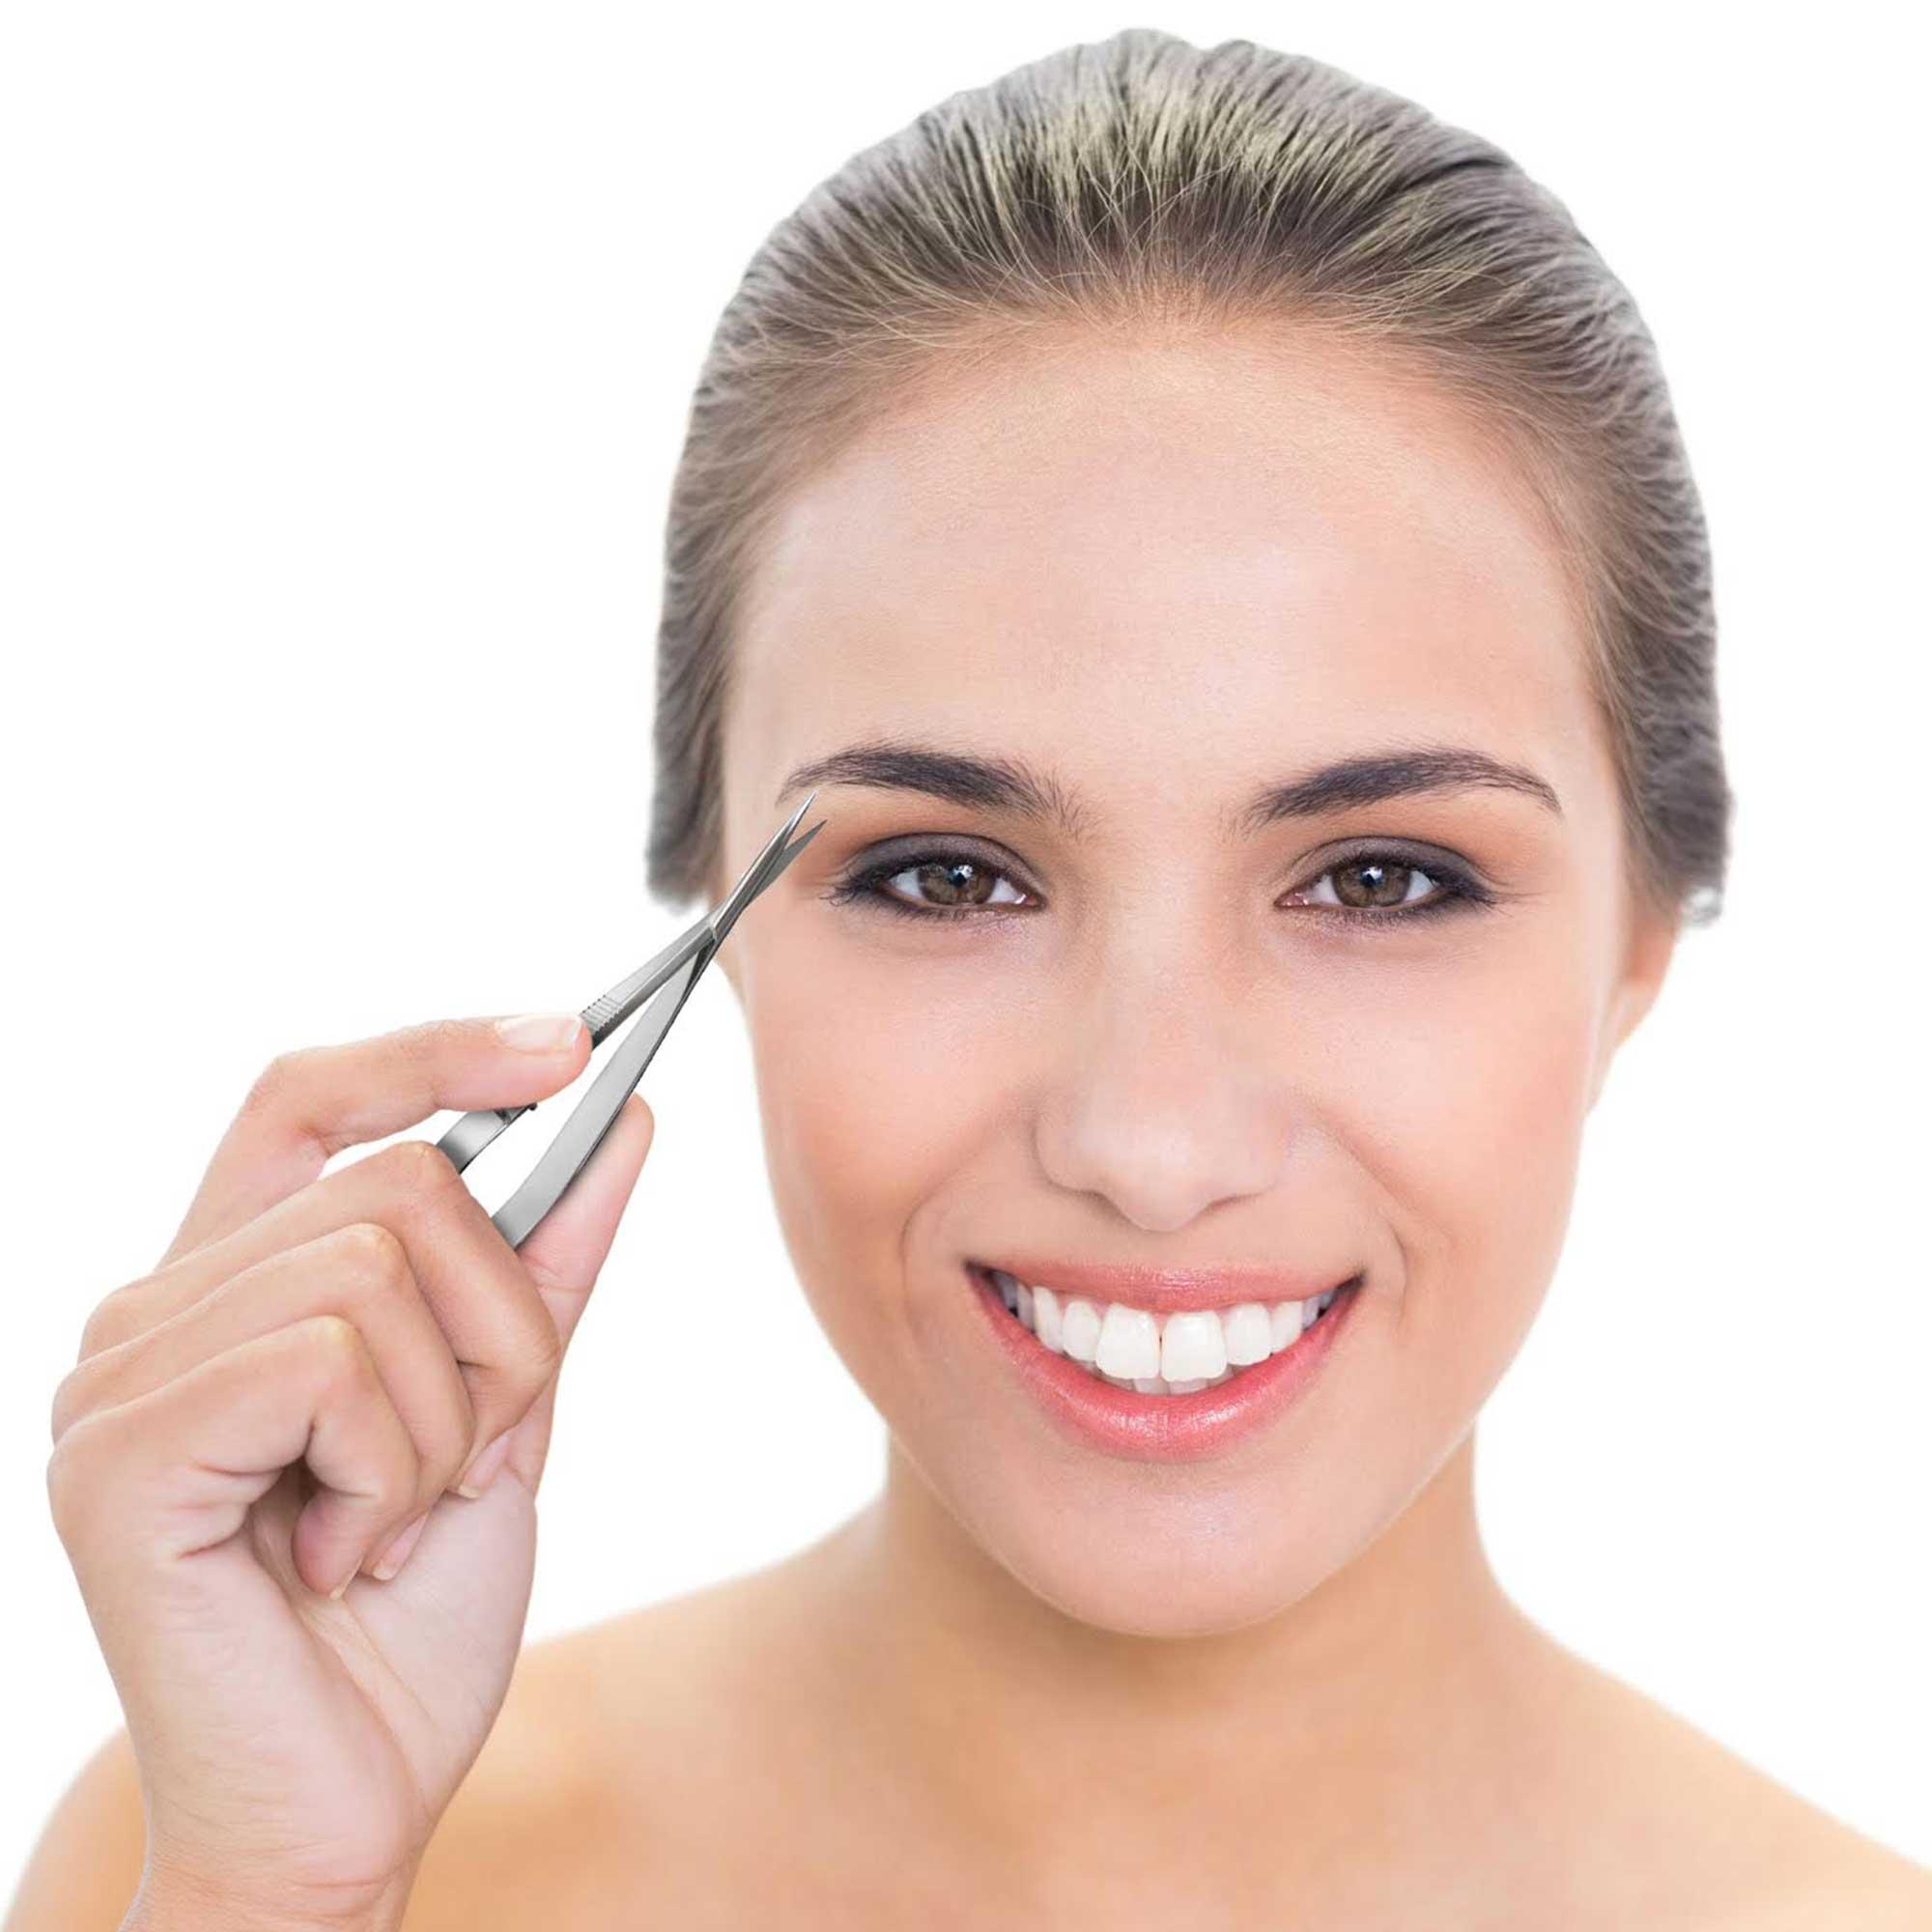 Astounding Facial Hair Scissors Pointed Tip Peak Products Short Hairstyles For Black Women Fulllsitofus